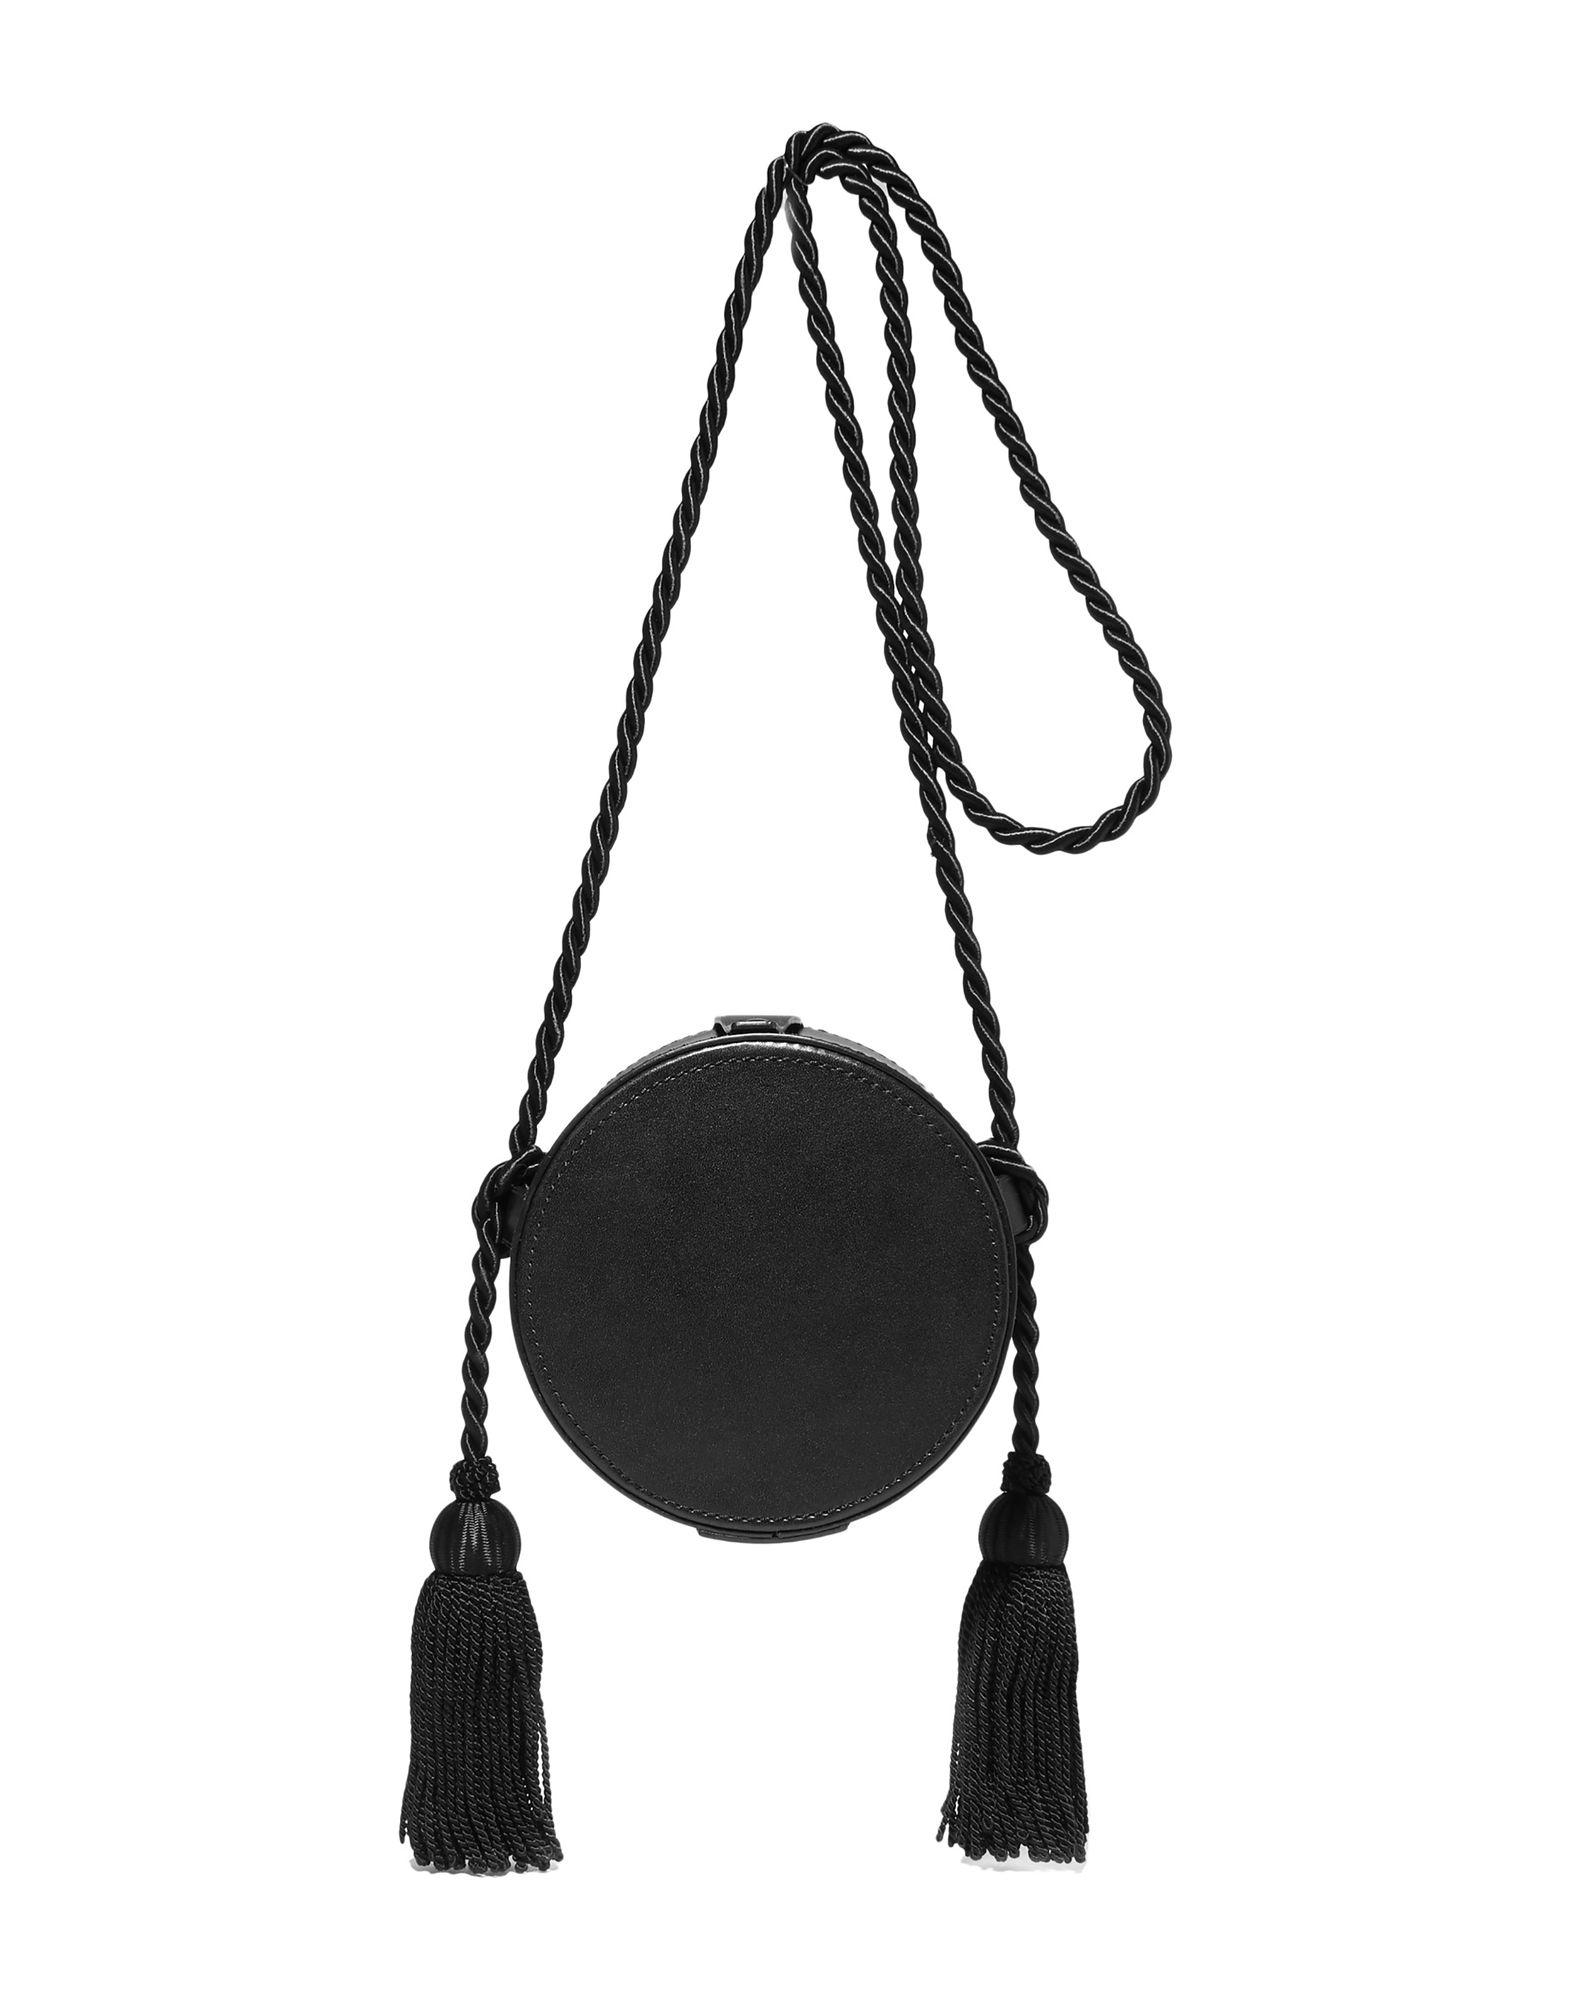 HILLIER BARTLEY Сумка через плечо сумка через плечо anais gvani croco ag 1471 350161